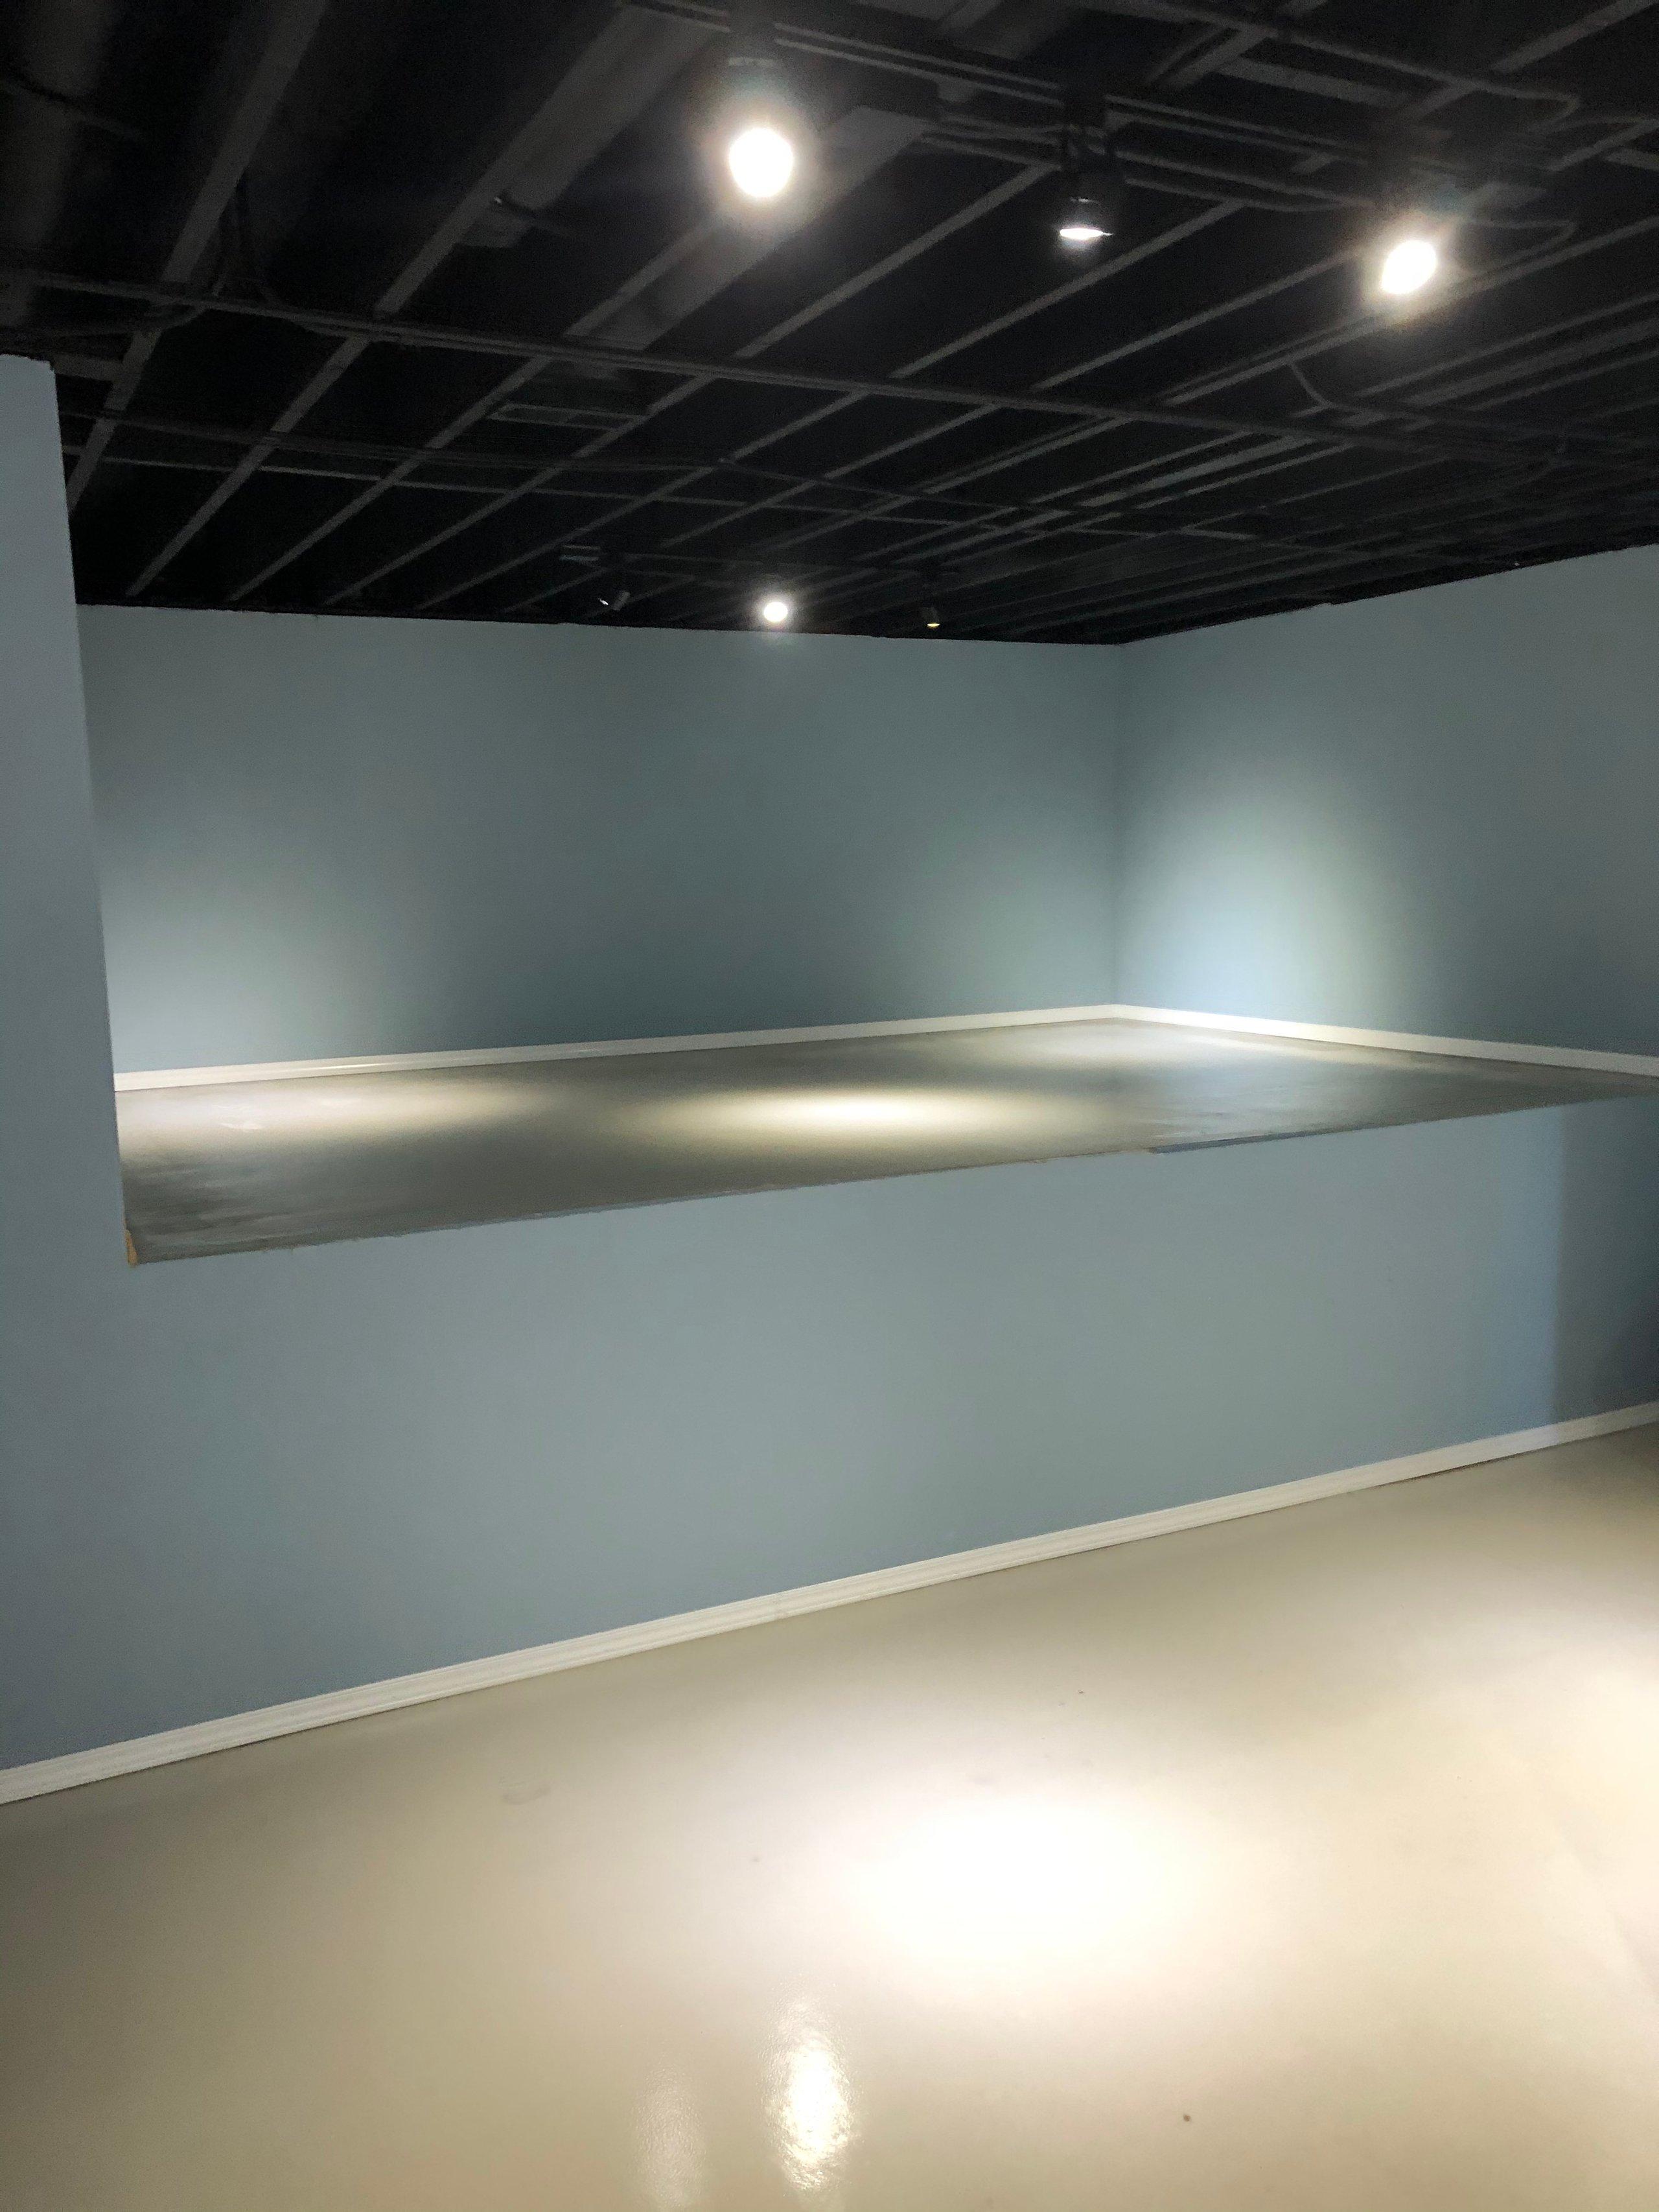 22x14 Basement self storage unit